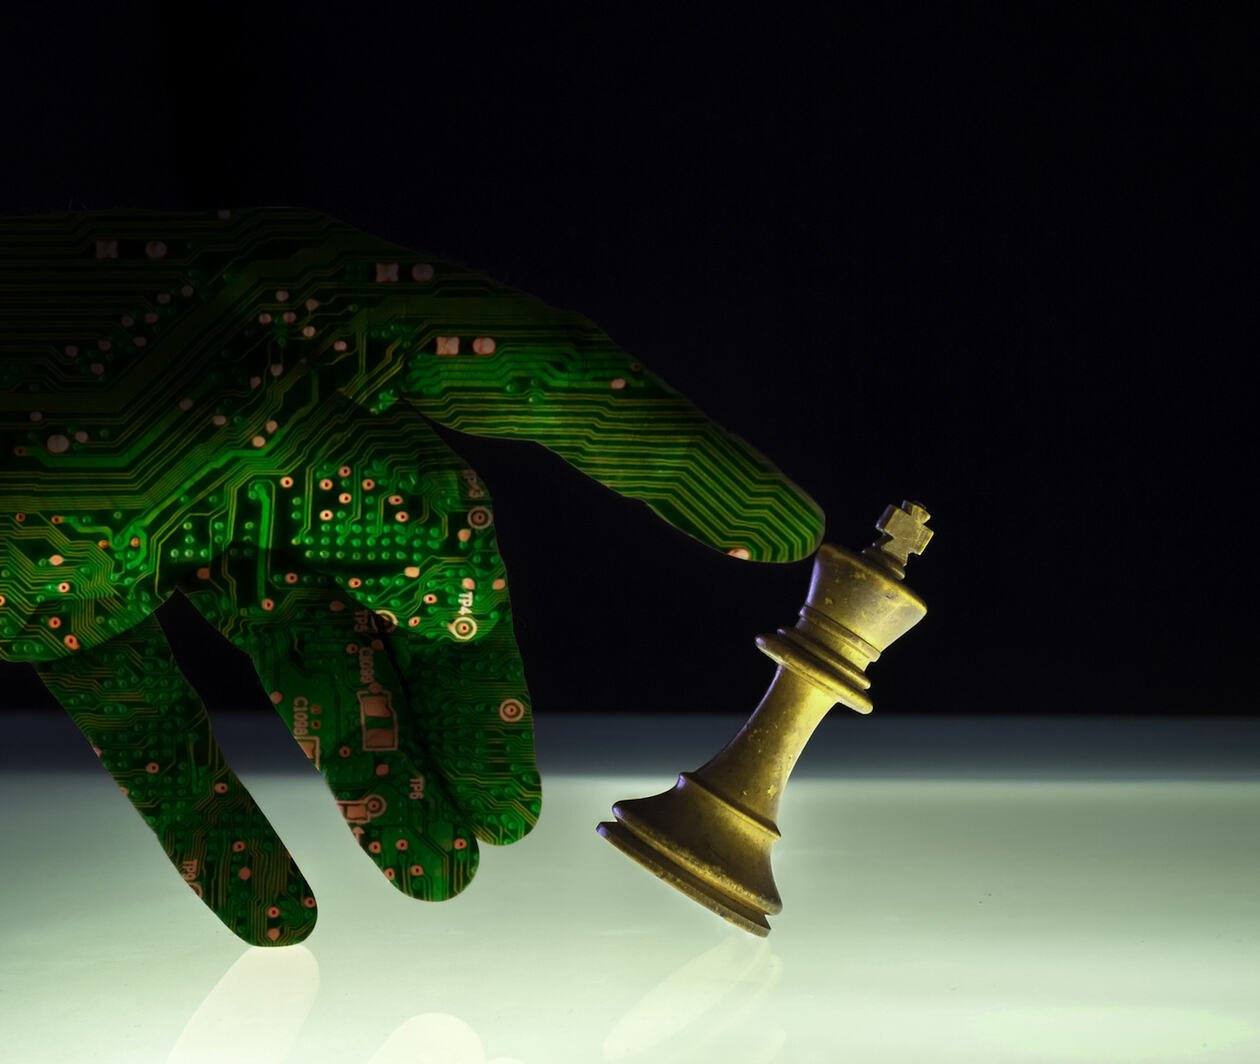 SIT740.5: Digital Ethics